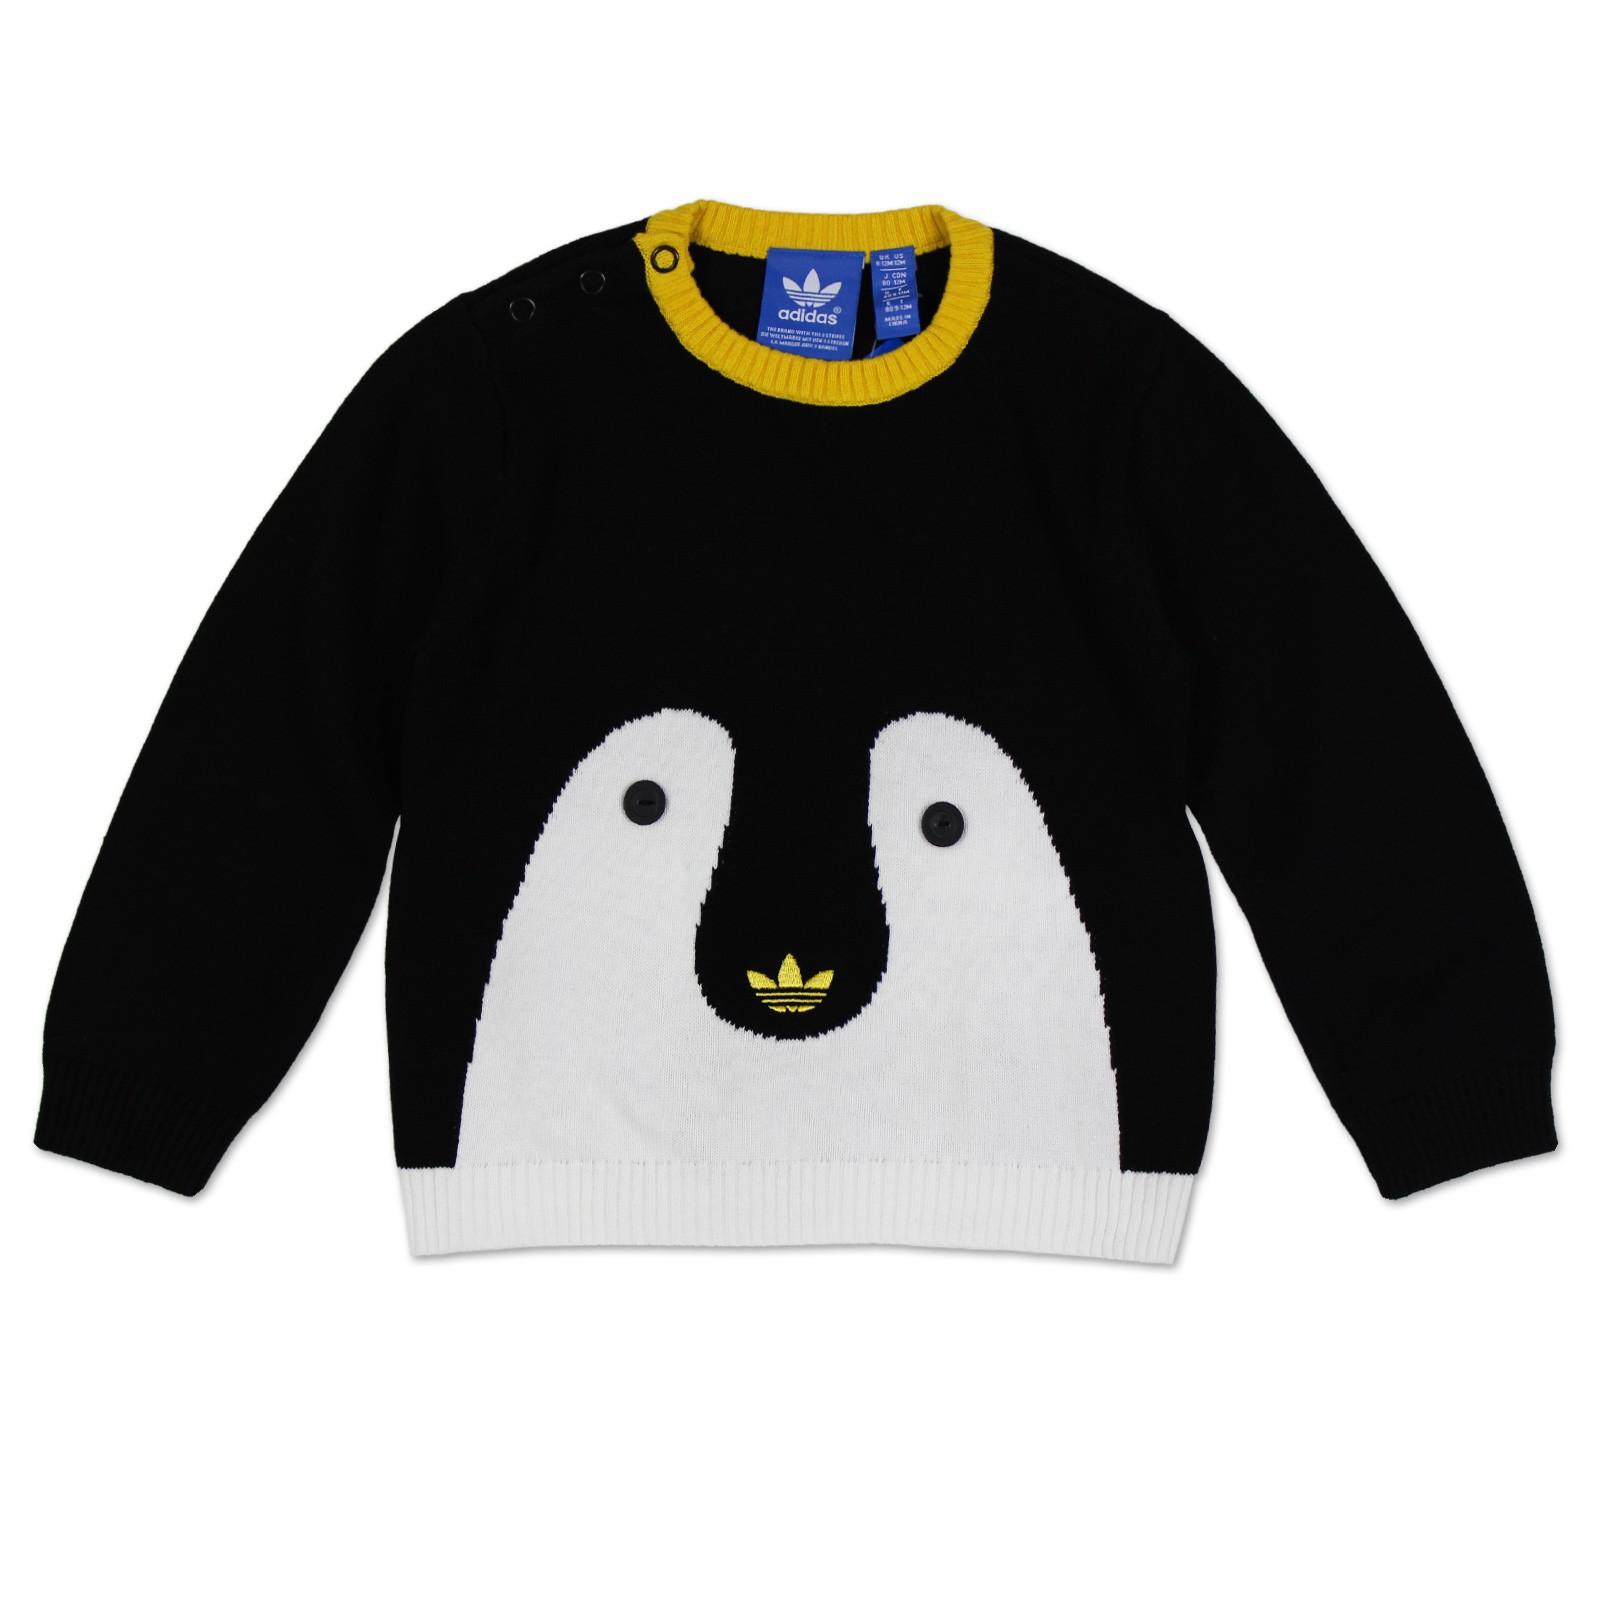 Adidas Originals Penguin Shirt Black / White